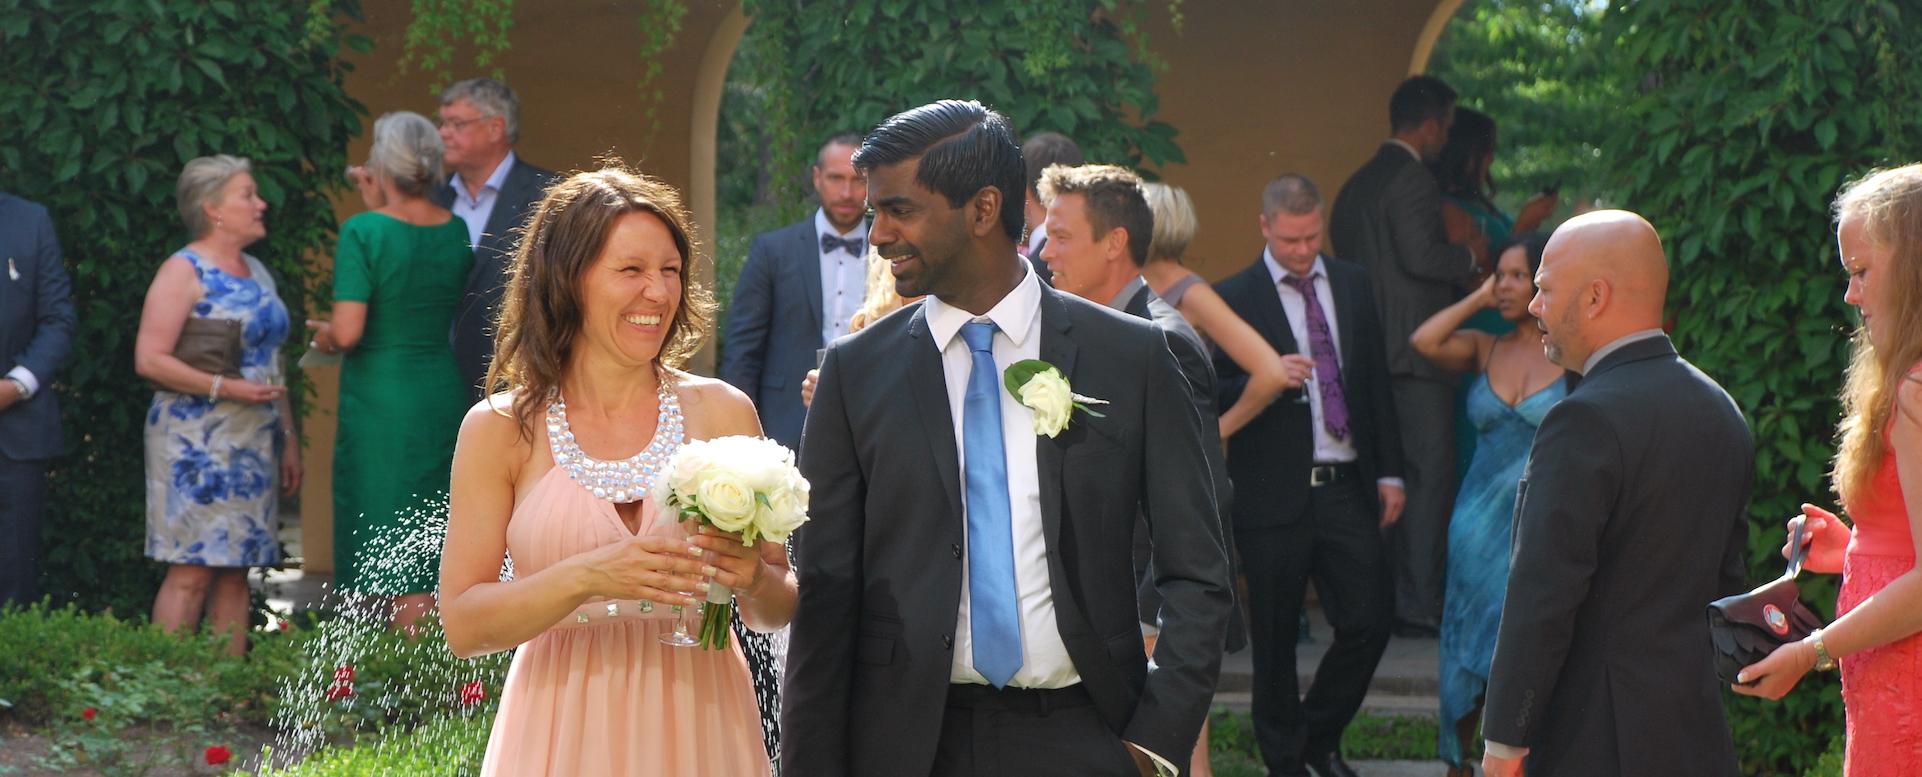 Bröllopsmingel_1920x775